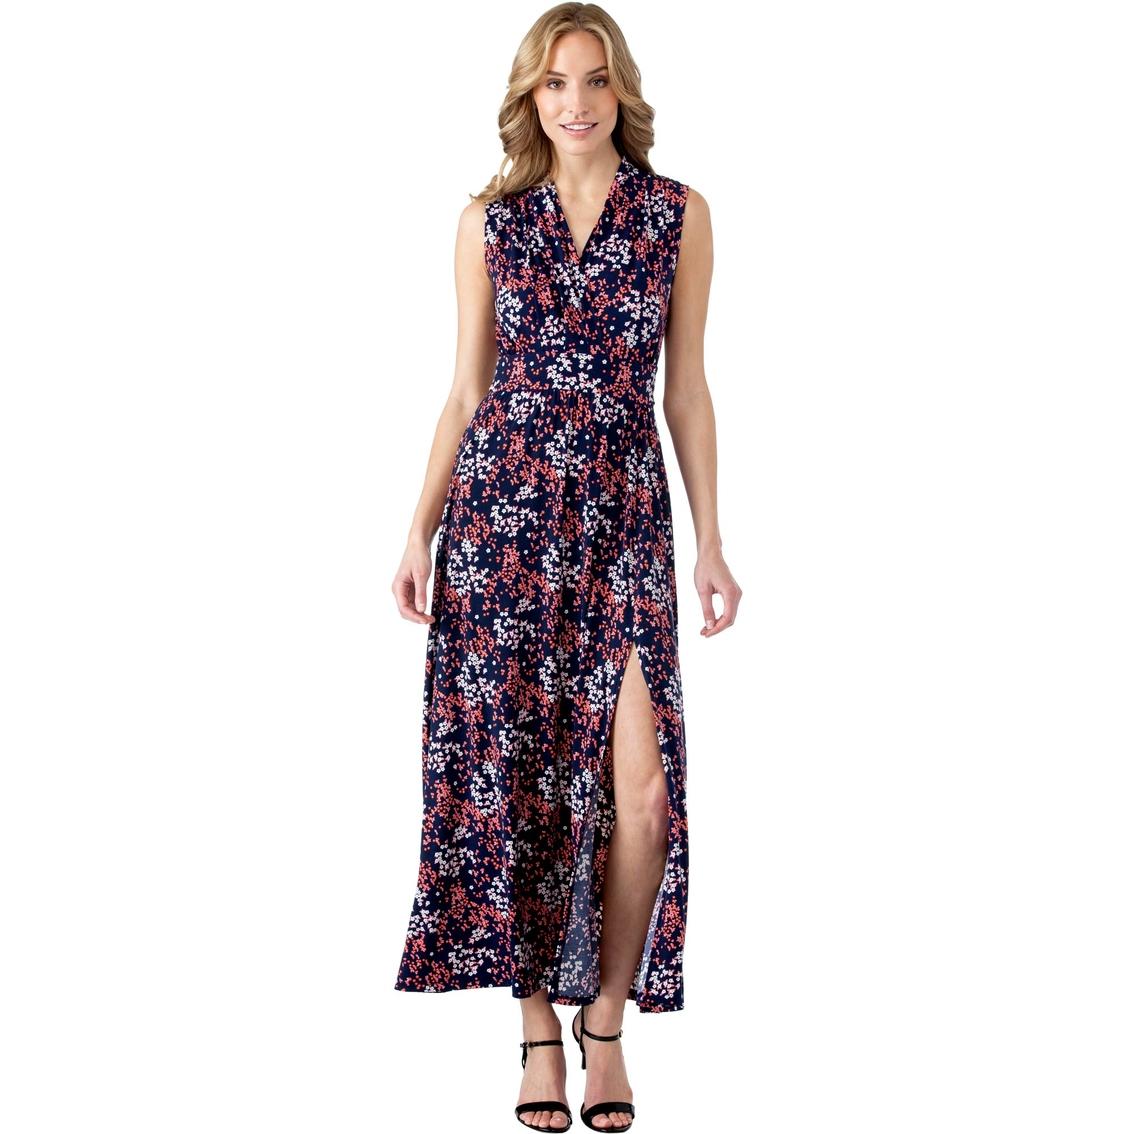 42f15730cb5 Michael Kors Petite Scattered Blooms Slit Maxi Dress